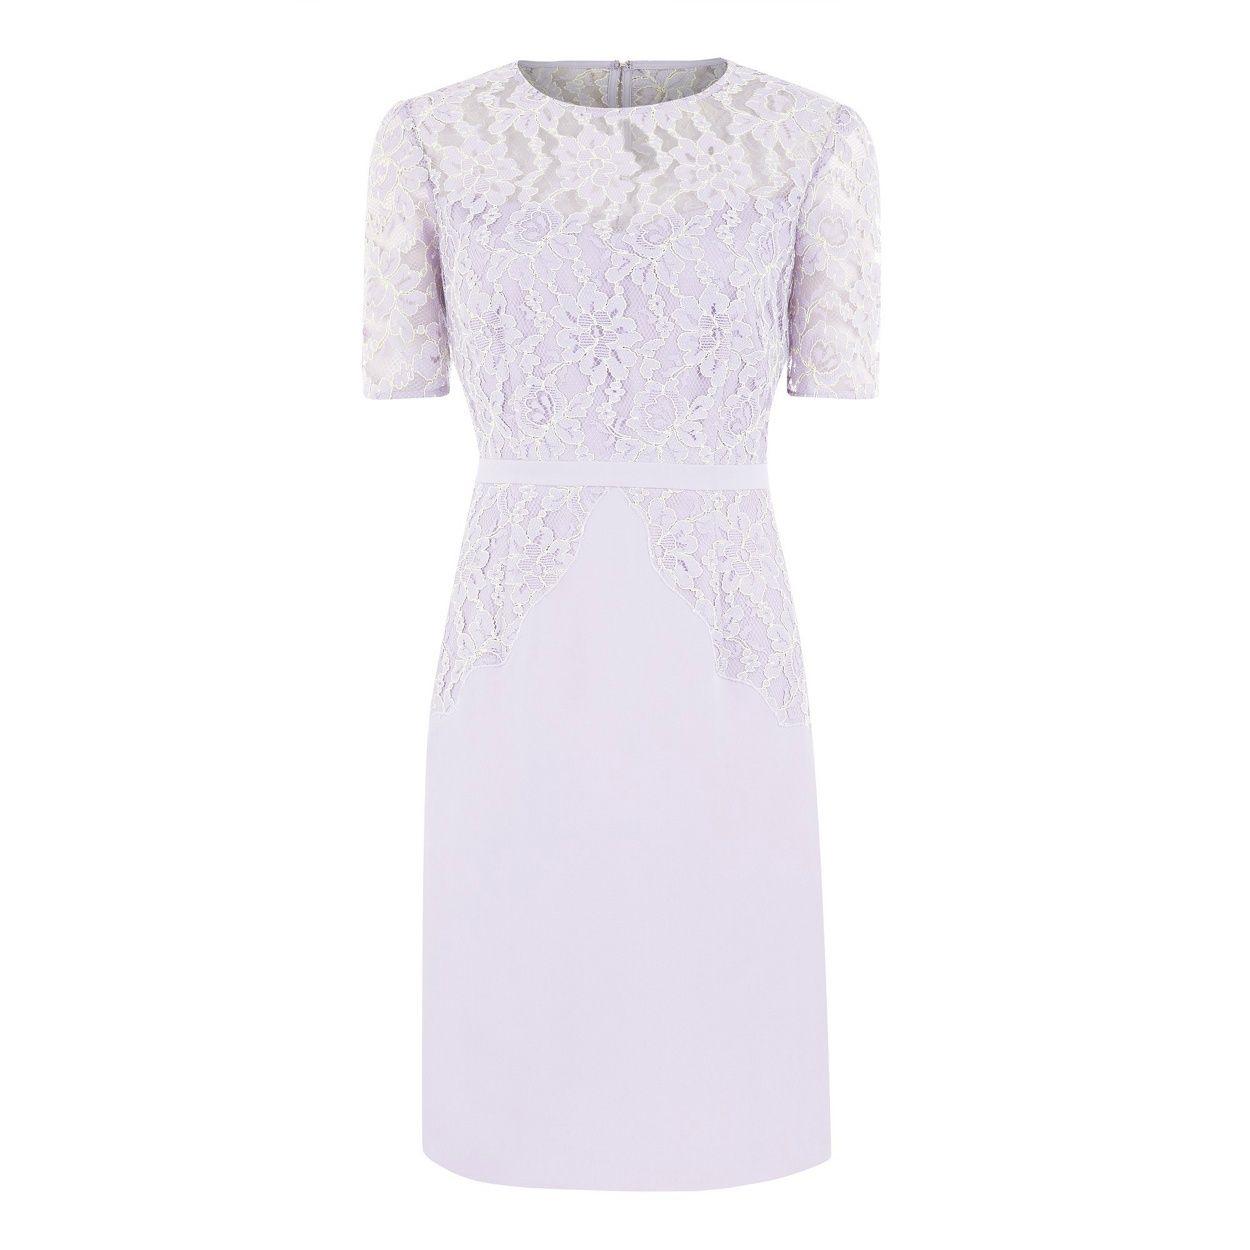 Kaliko cotton lace dress purple